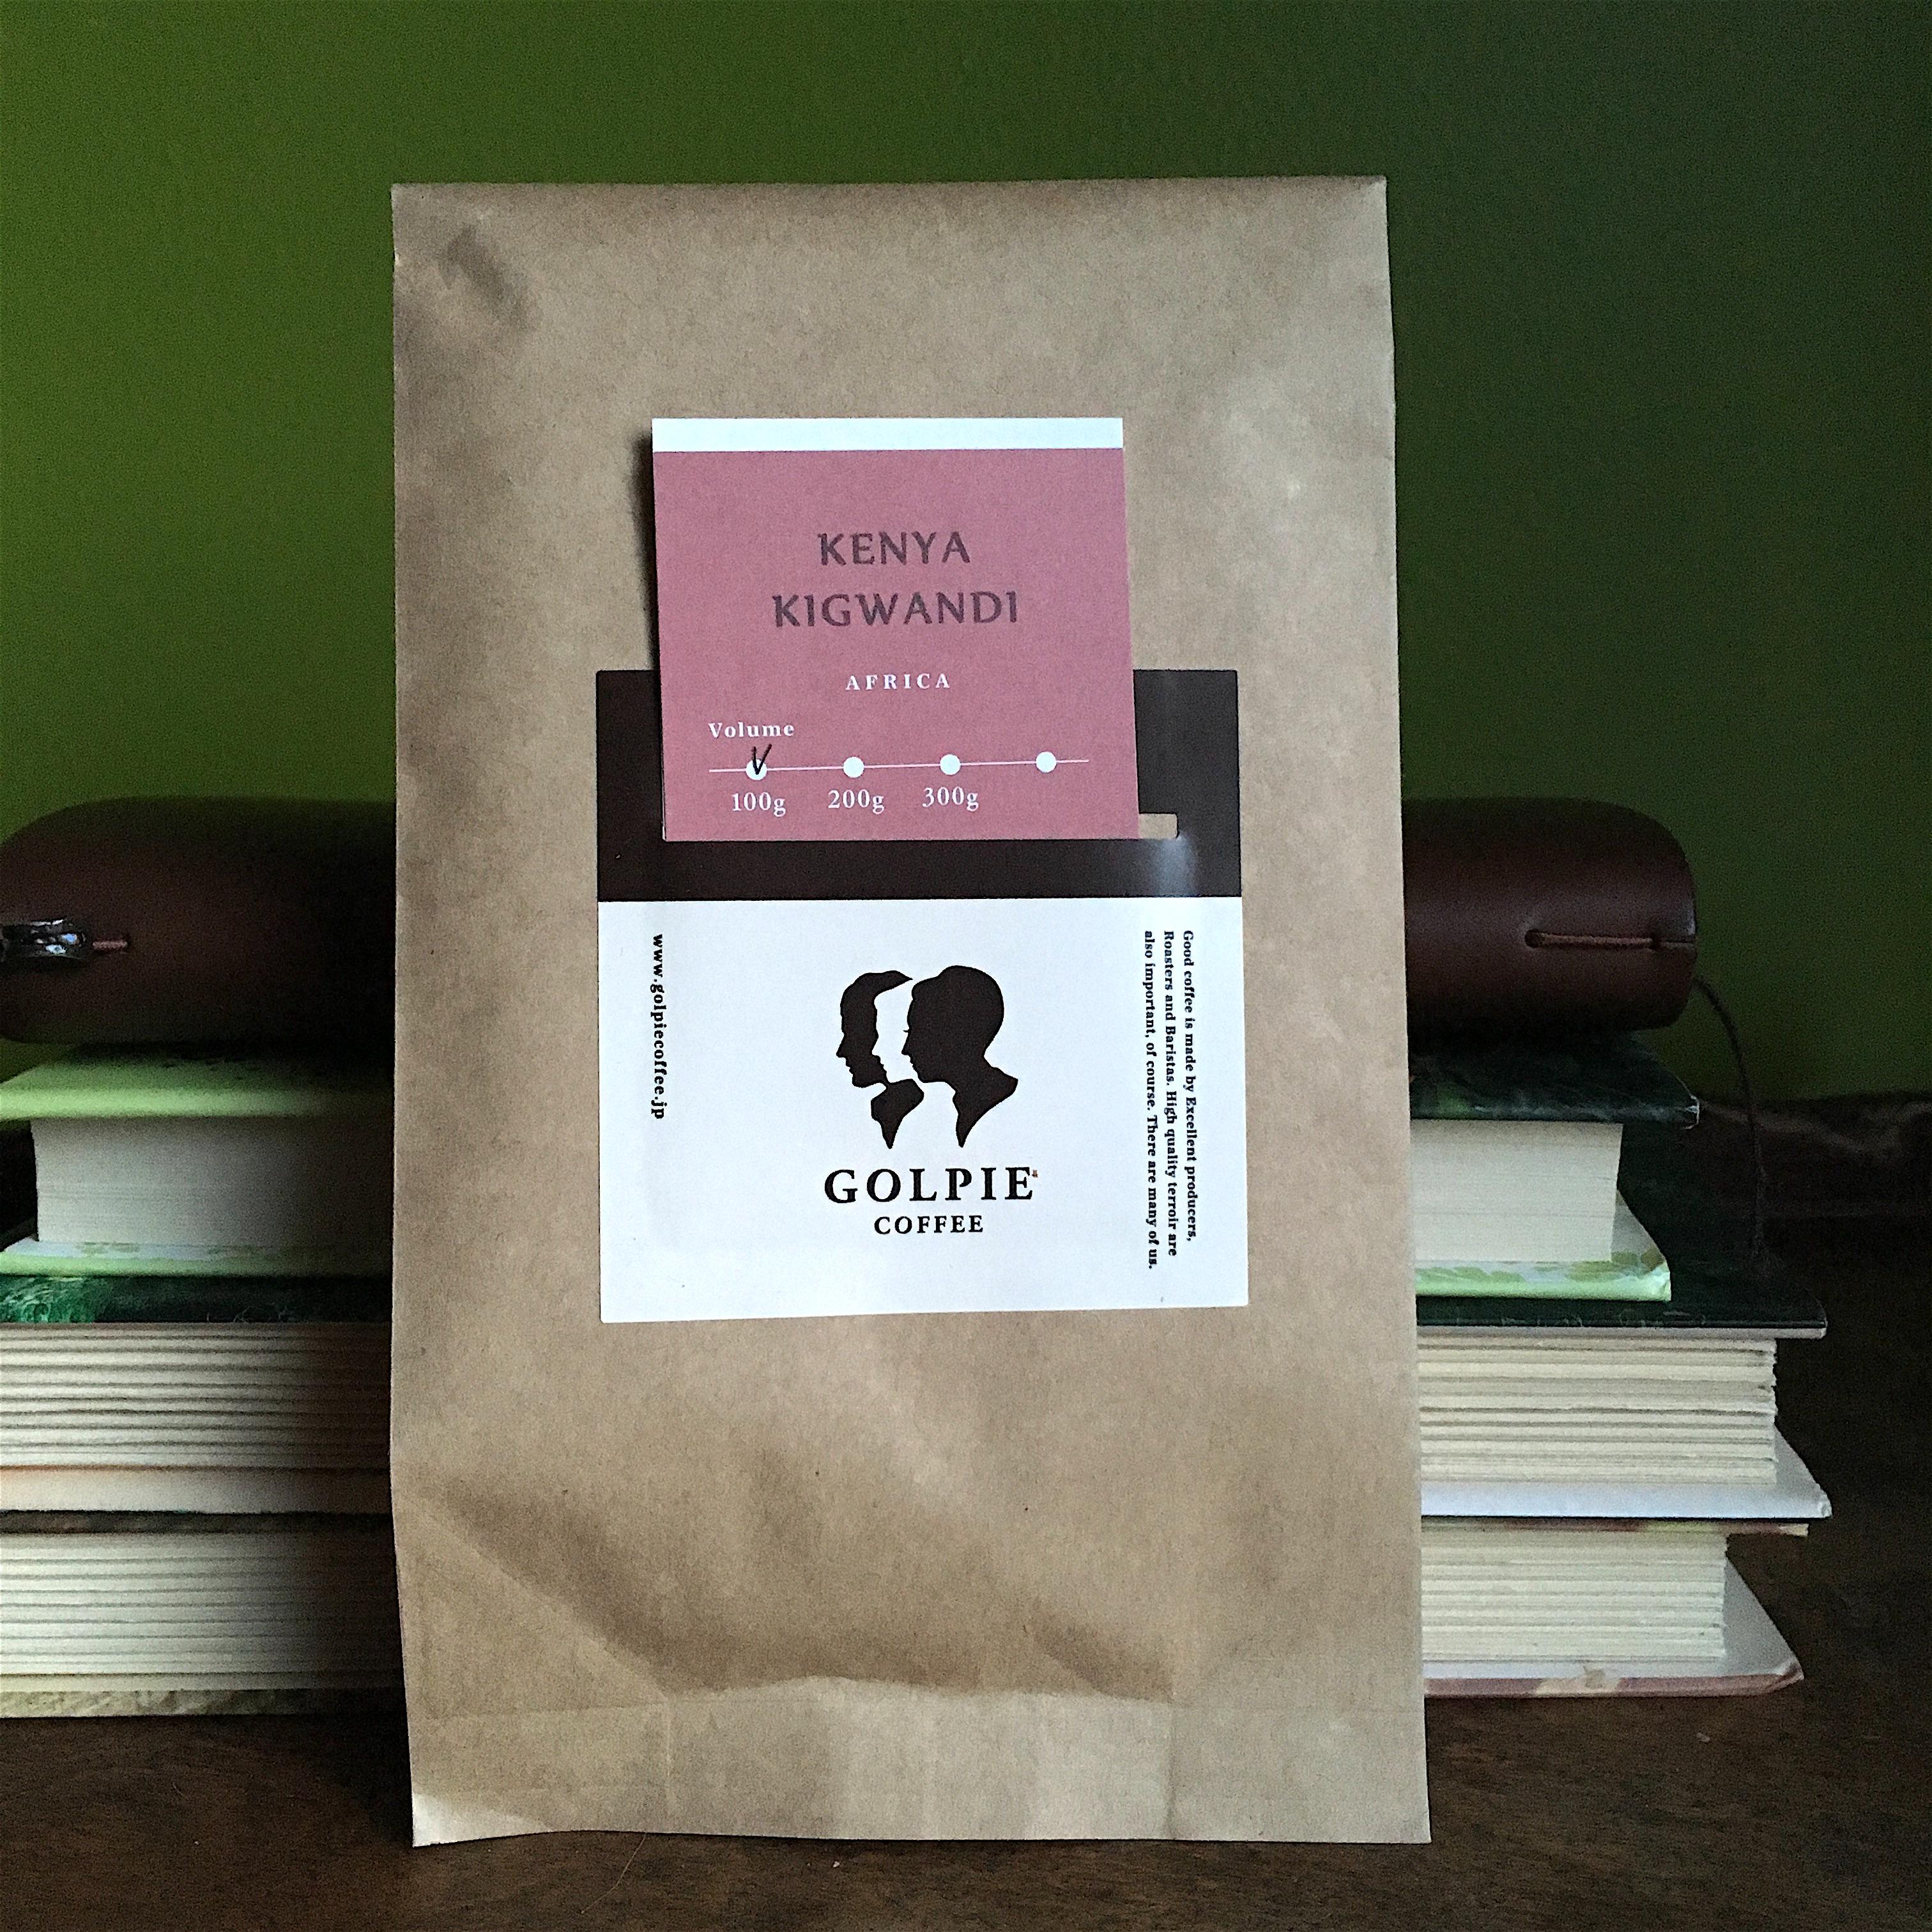 Golpie Coffee Kenya Kigwandi